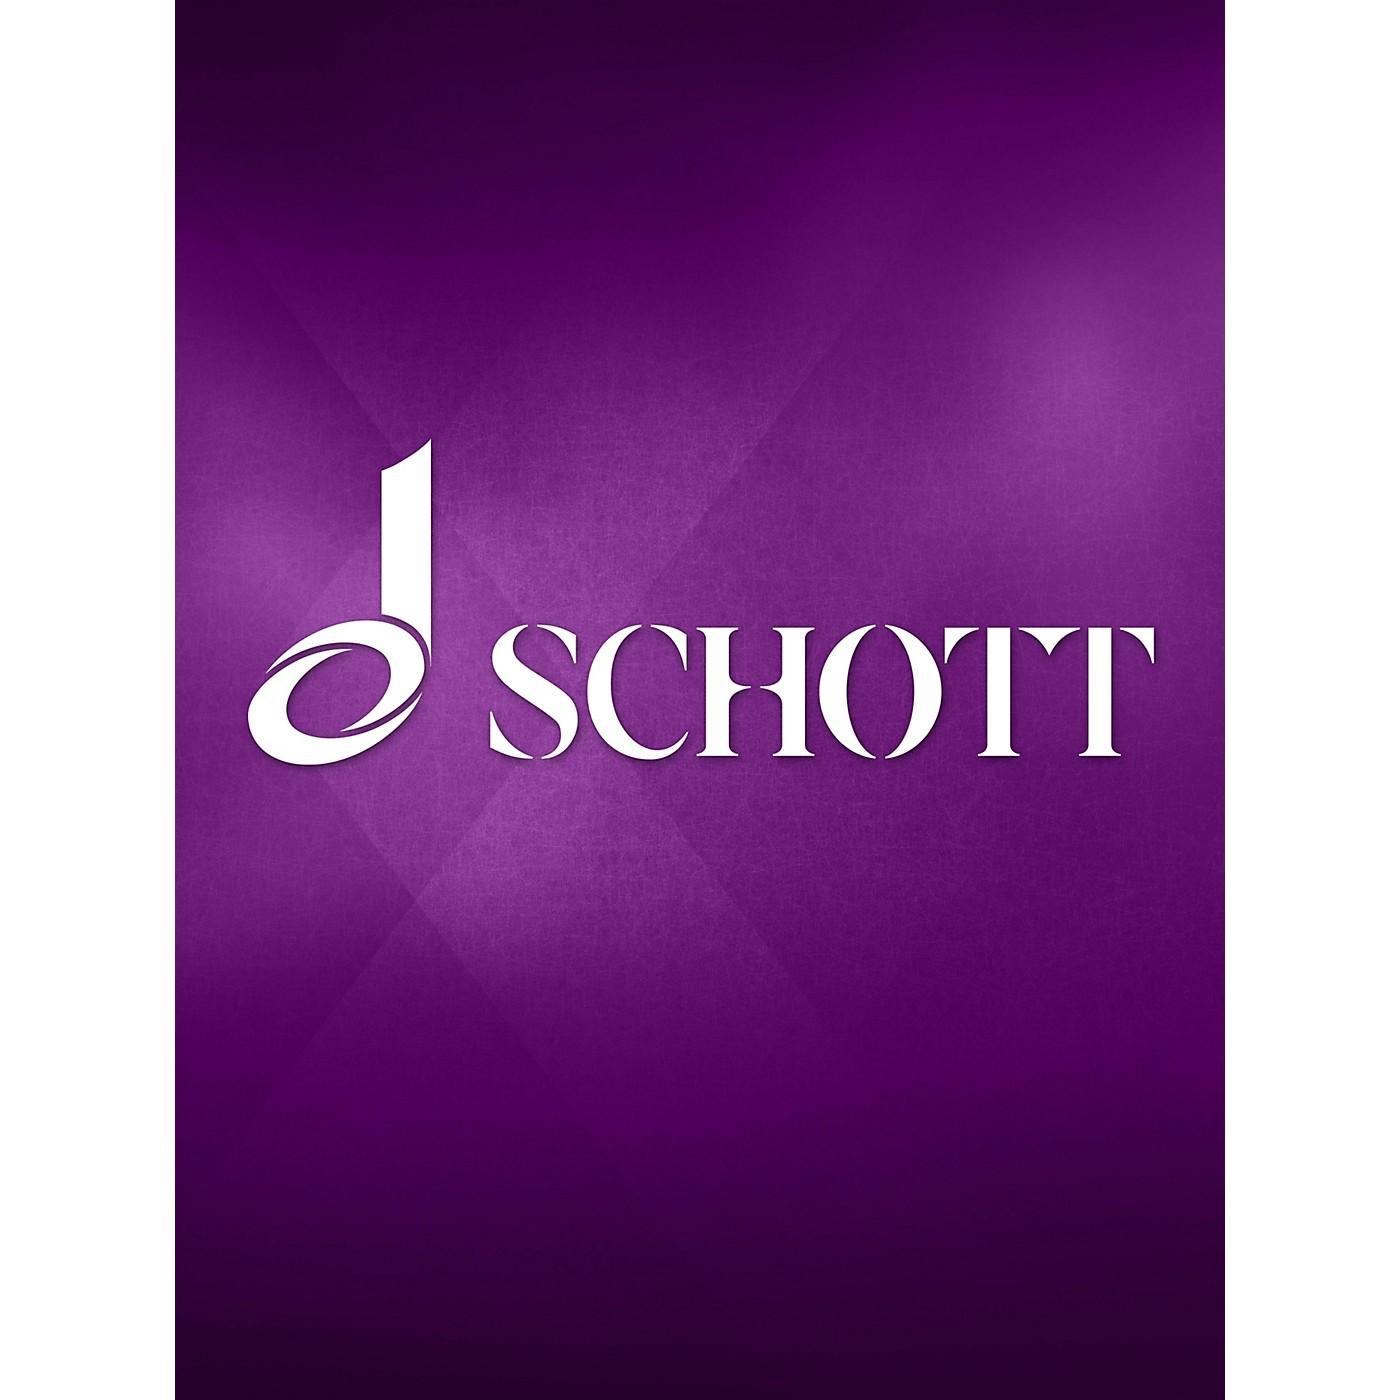 Schott Kammermusik zur Weihnachtzeit (Chamber Music for Christmas Time Violin 2 Part) Schott Series thumbnail